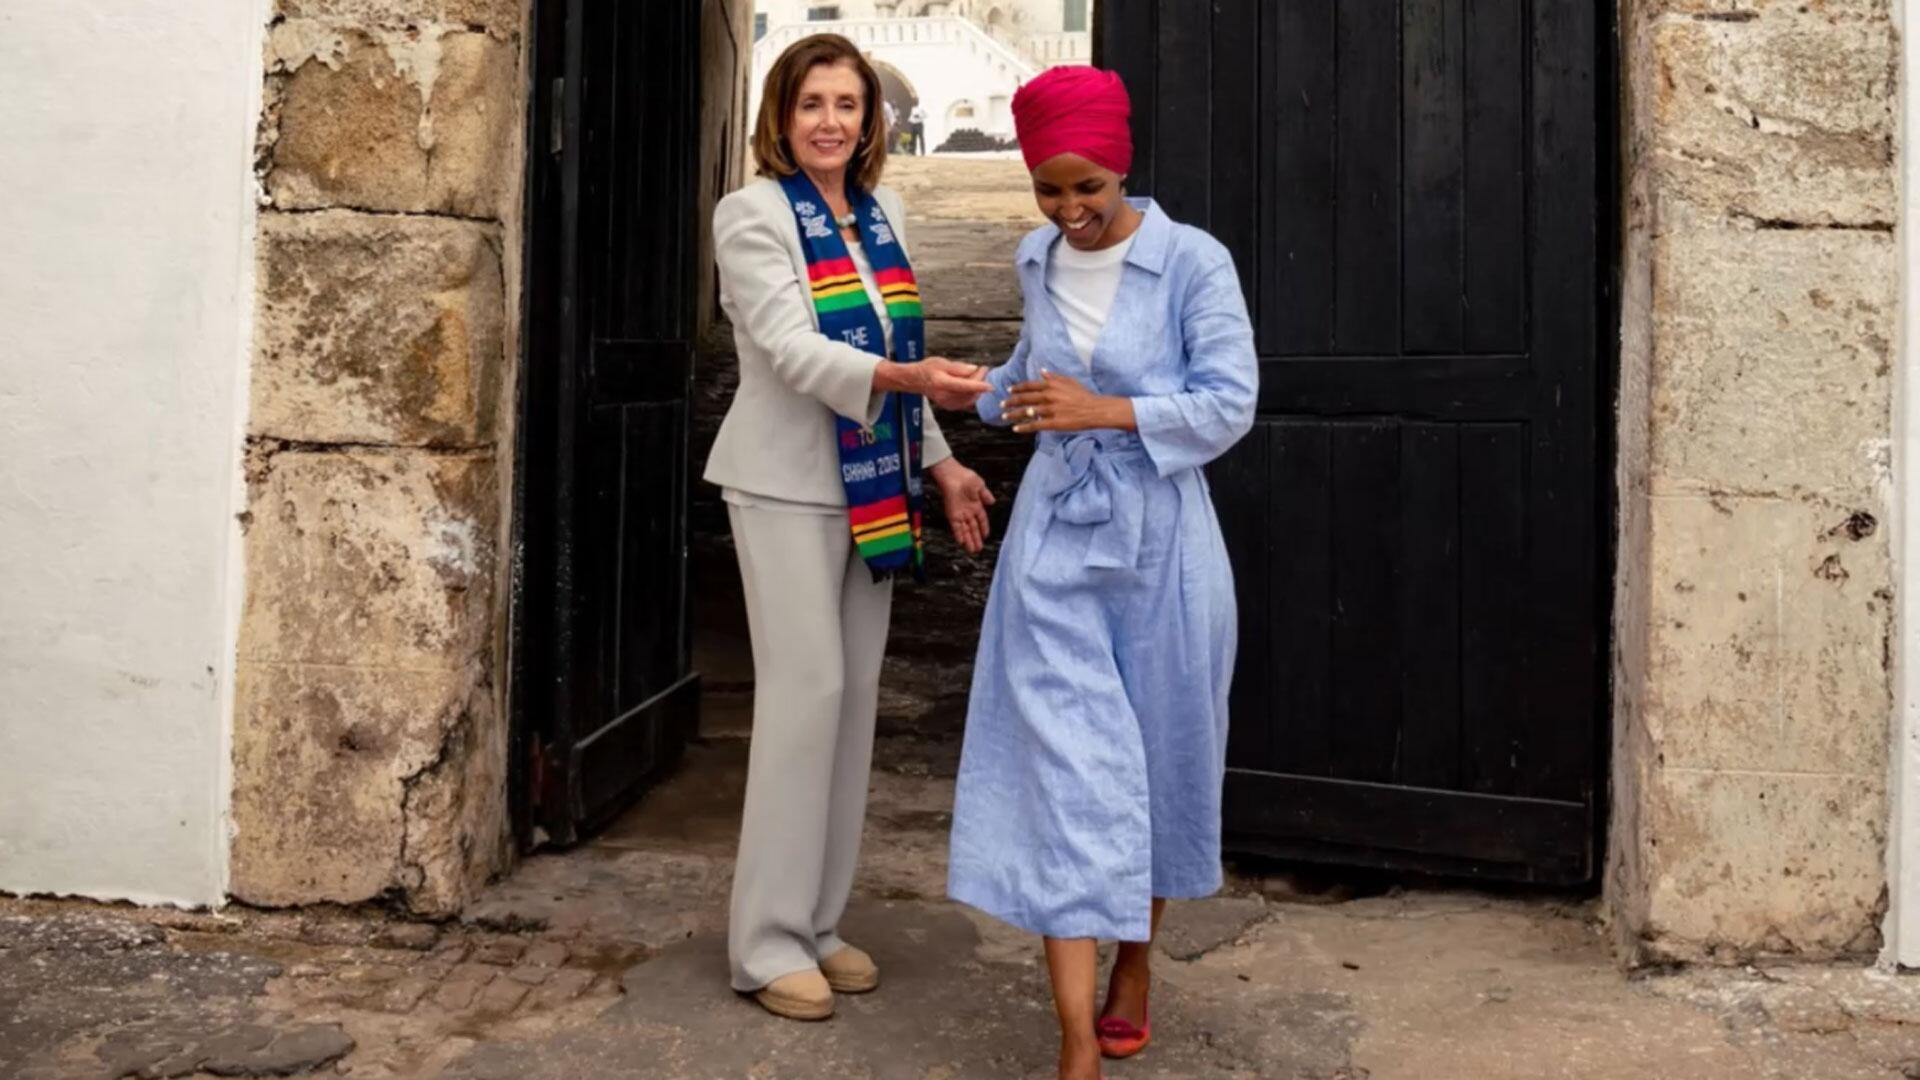 Bild zu Nancy Pelosi, Ilhan Omar, Demokraten, USA, Reise, Afrika, Twitter